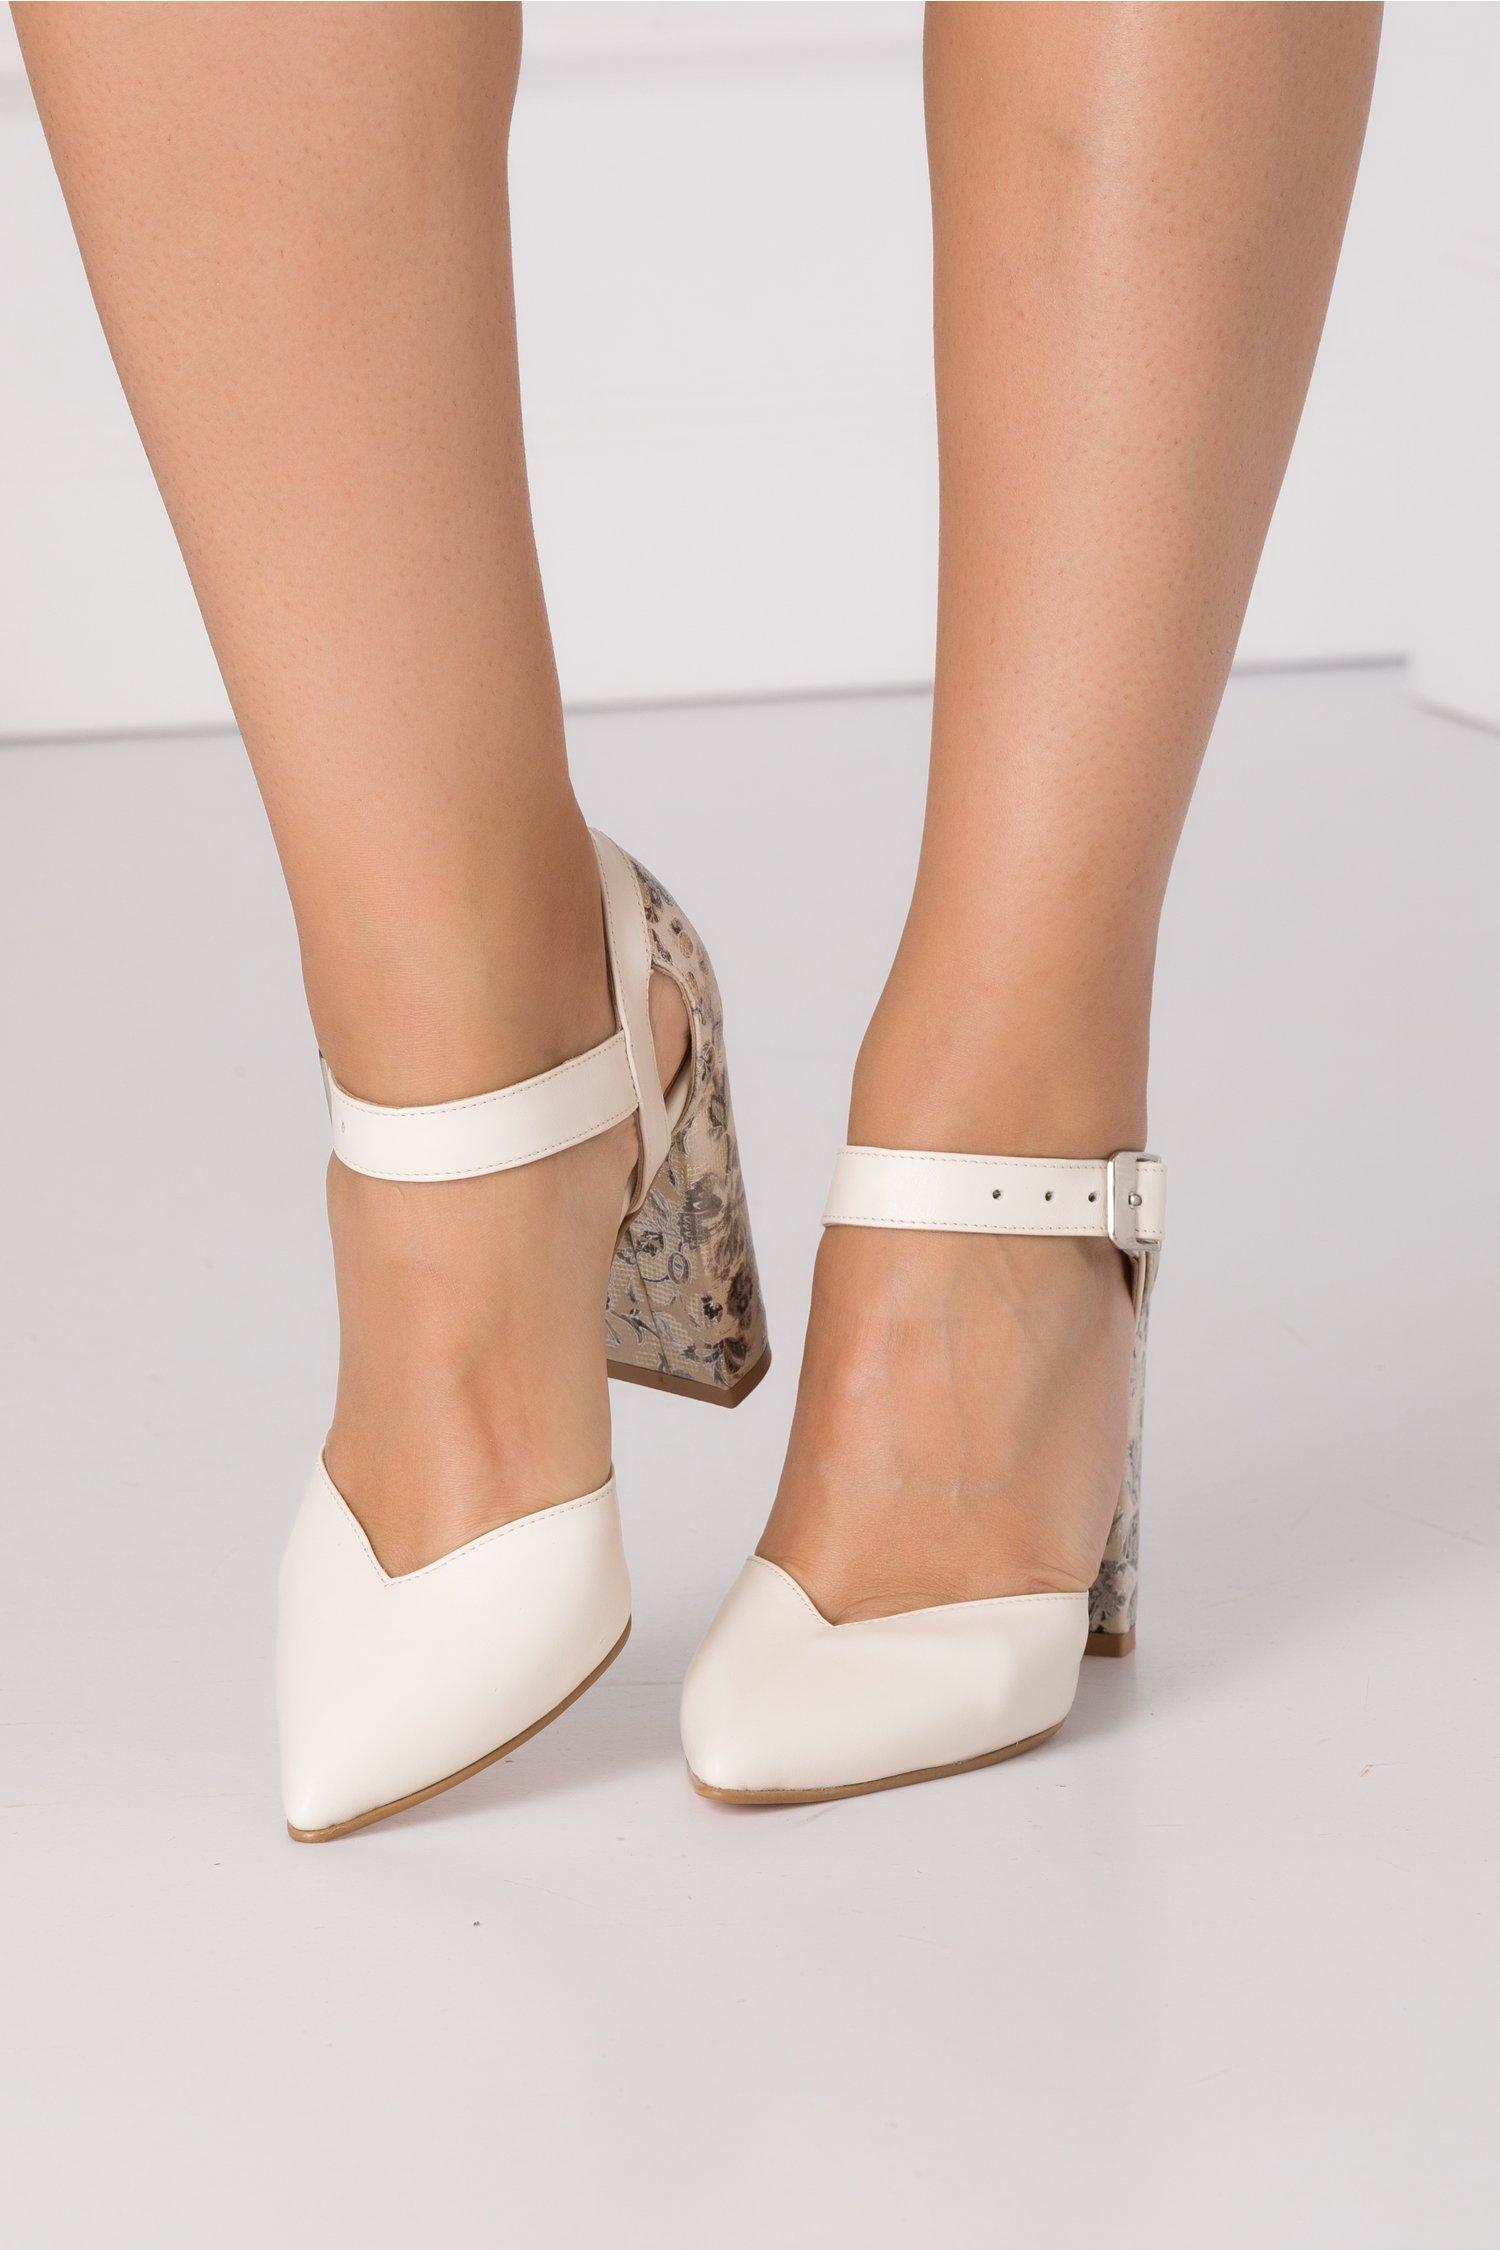 Pantofi bej decupati cu imprimeu floral in partea din spate